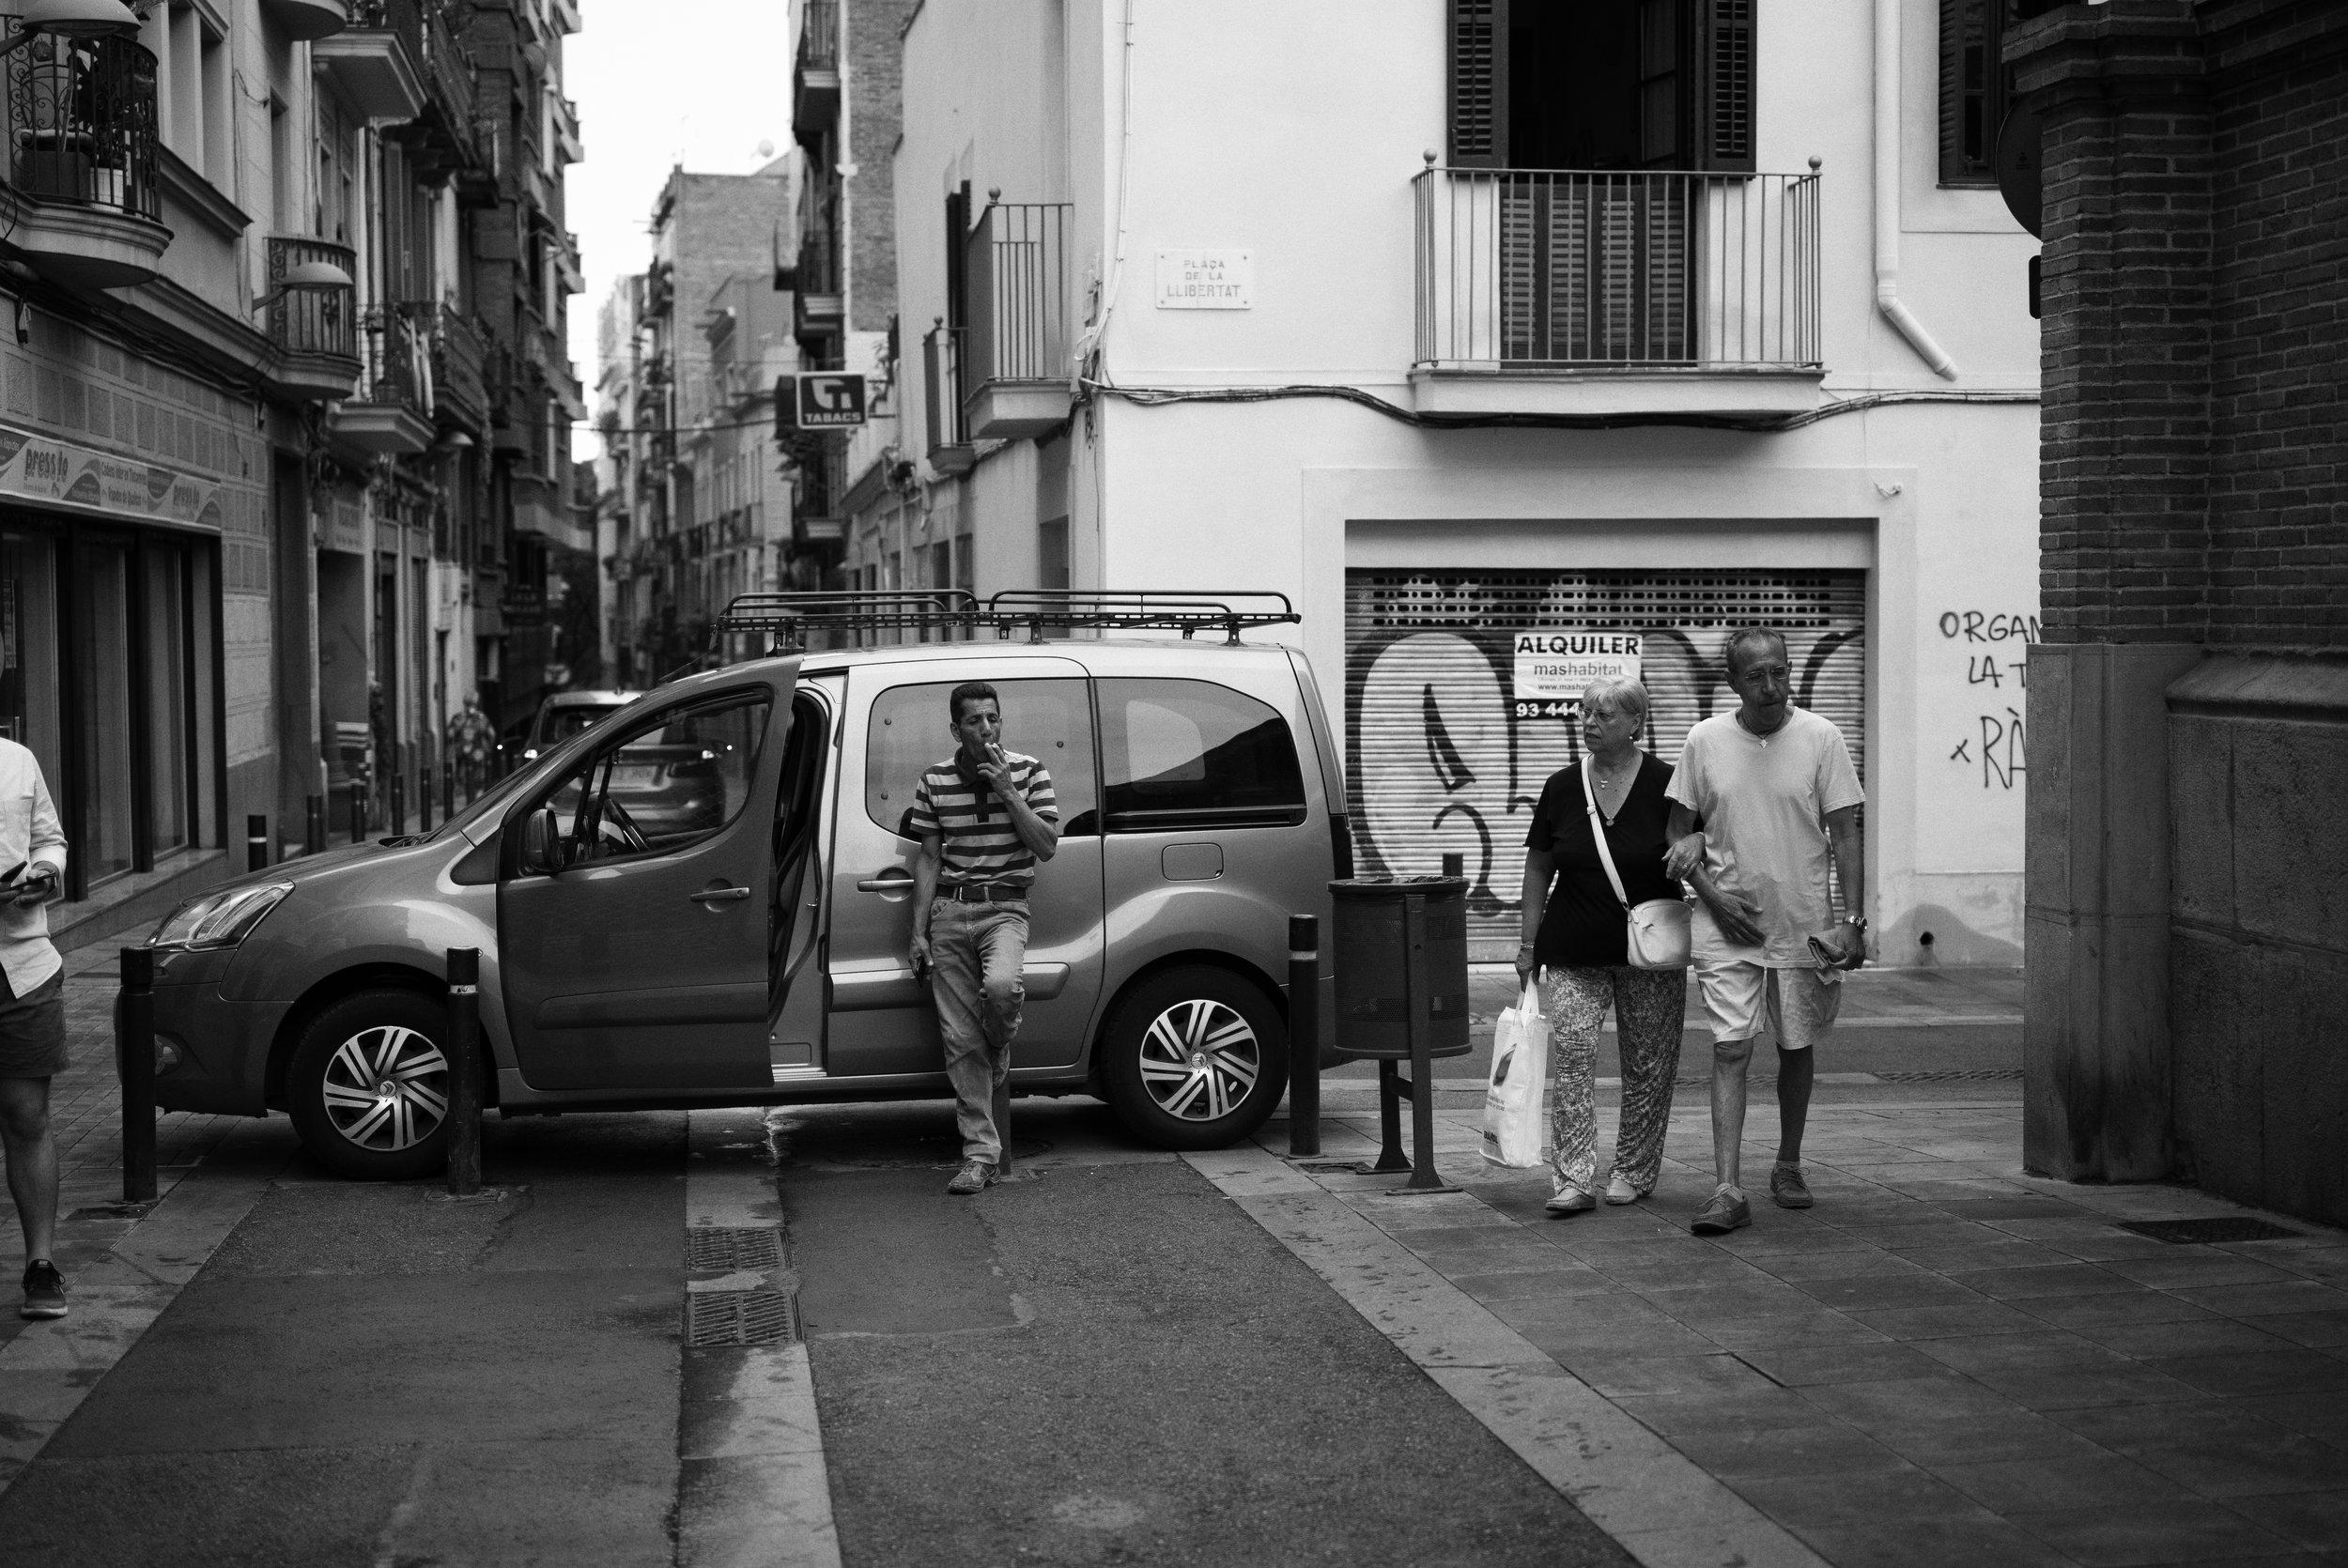 I need a smoke Barcelona, Catalonia, Spain Leica M (Typ 246) 50mm f/2.0 APO Summicron  © Keith R. Sbiral, 2018